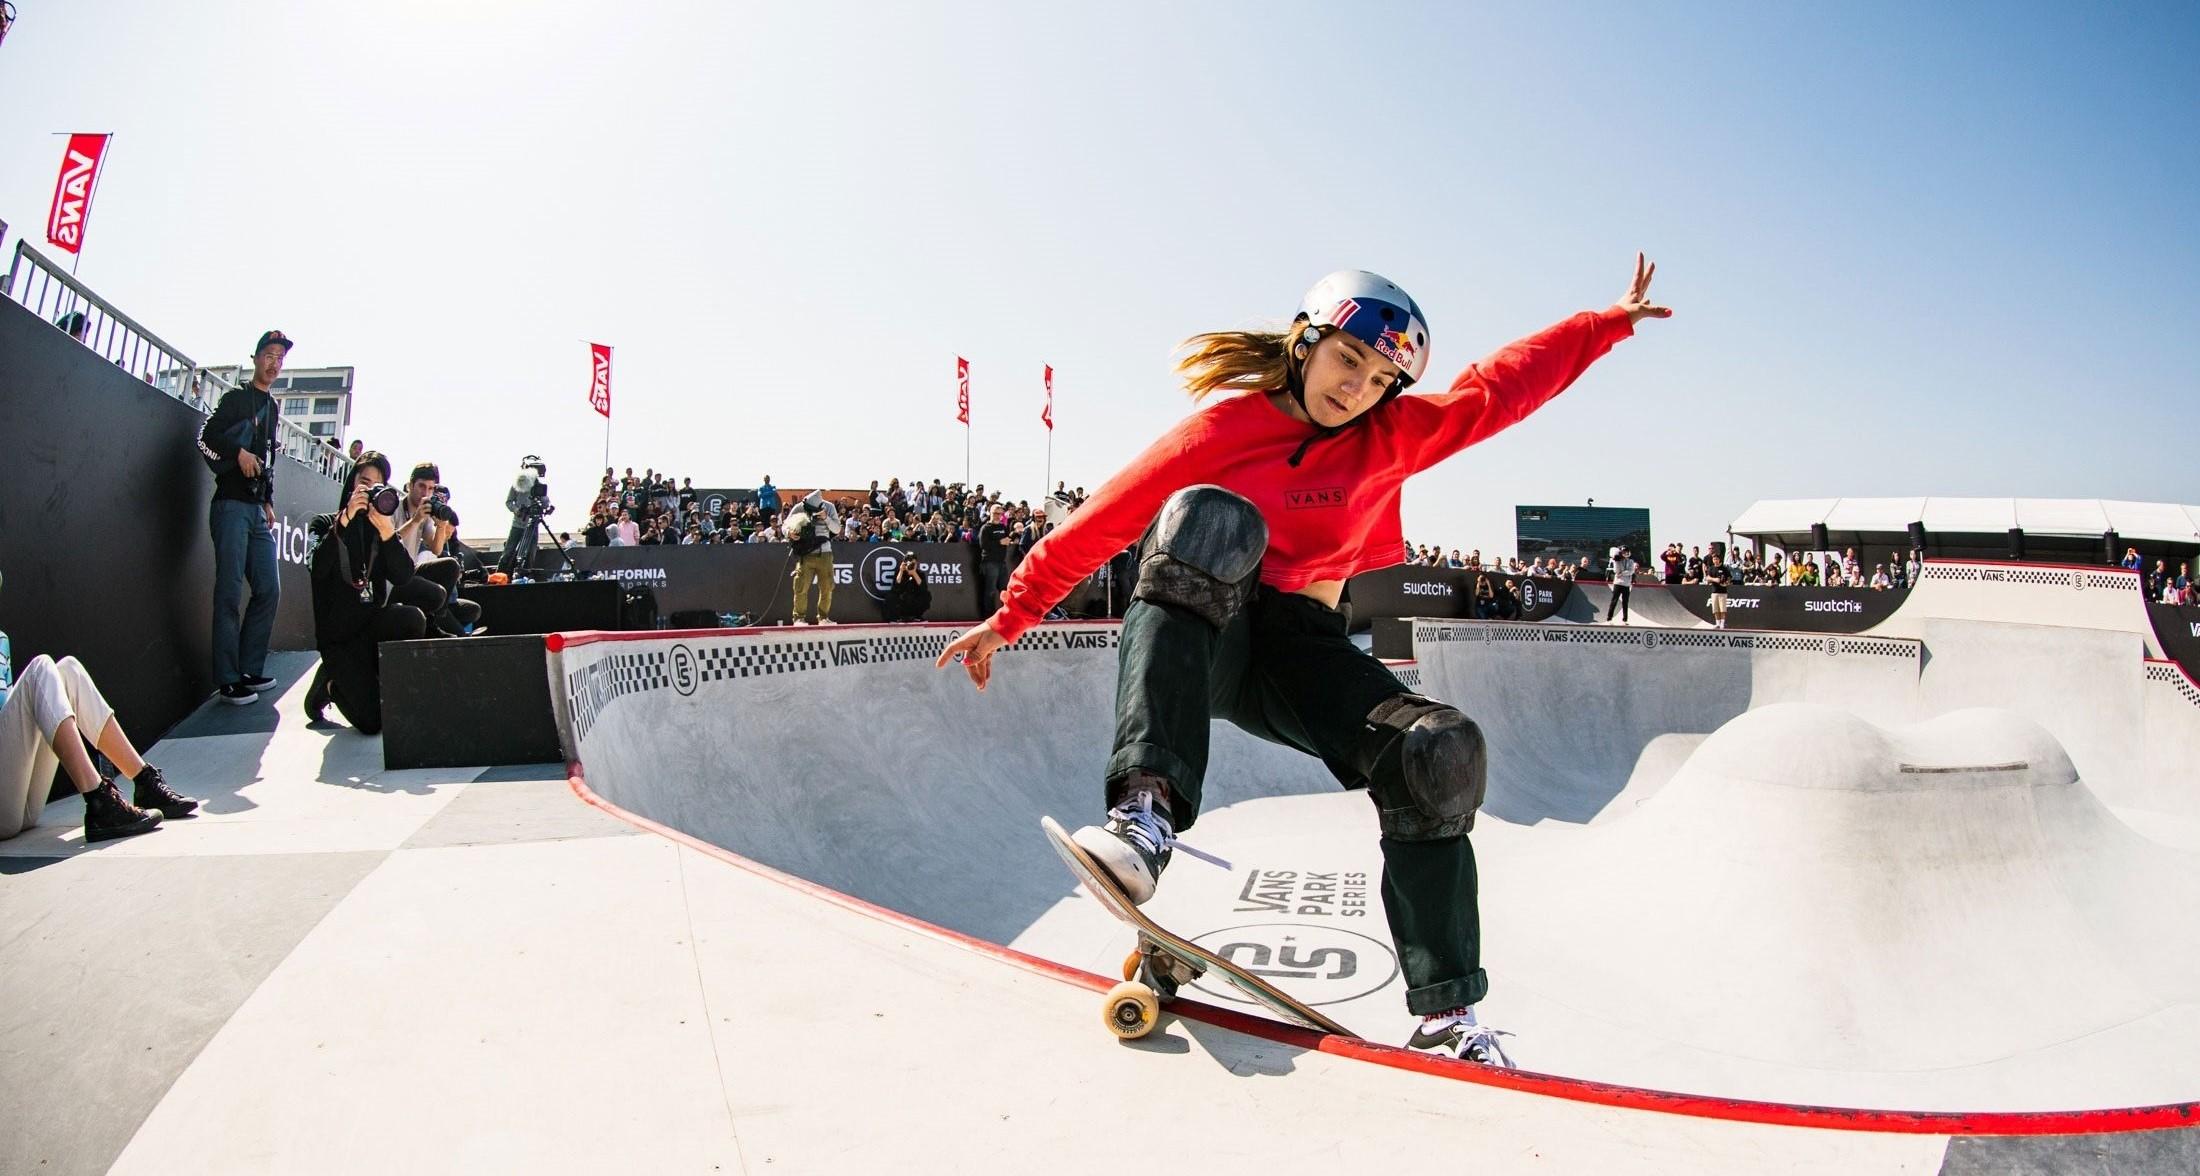 2018Vans职业公园滑板赛总决赛精彩落幕